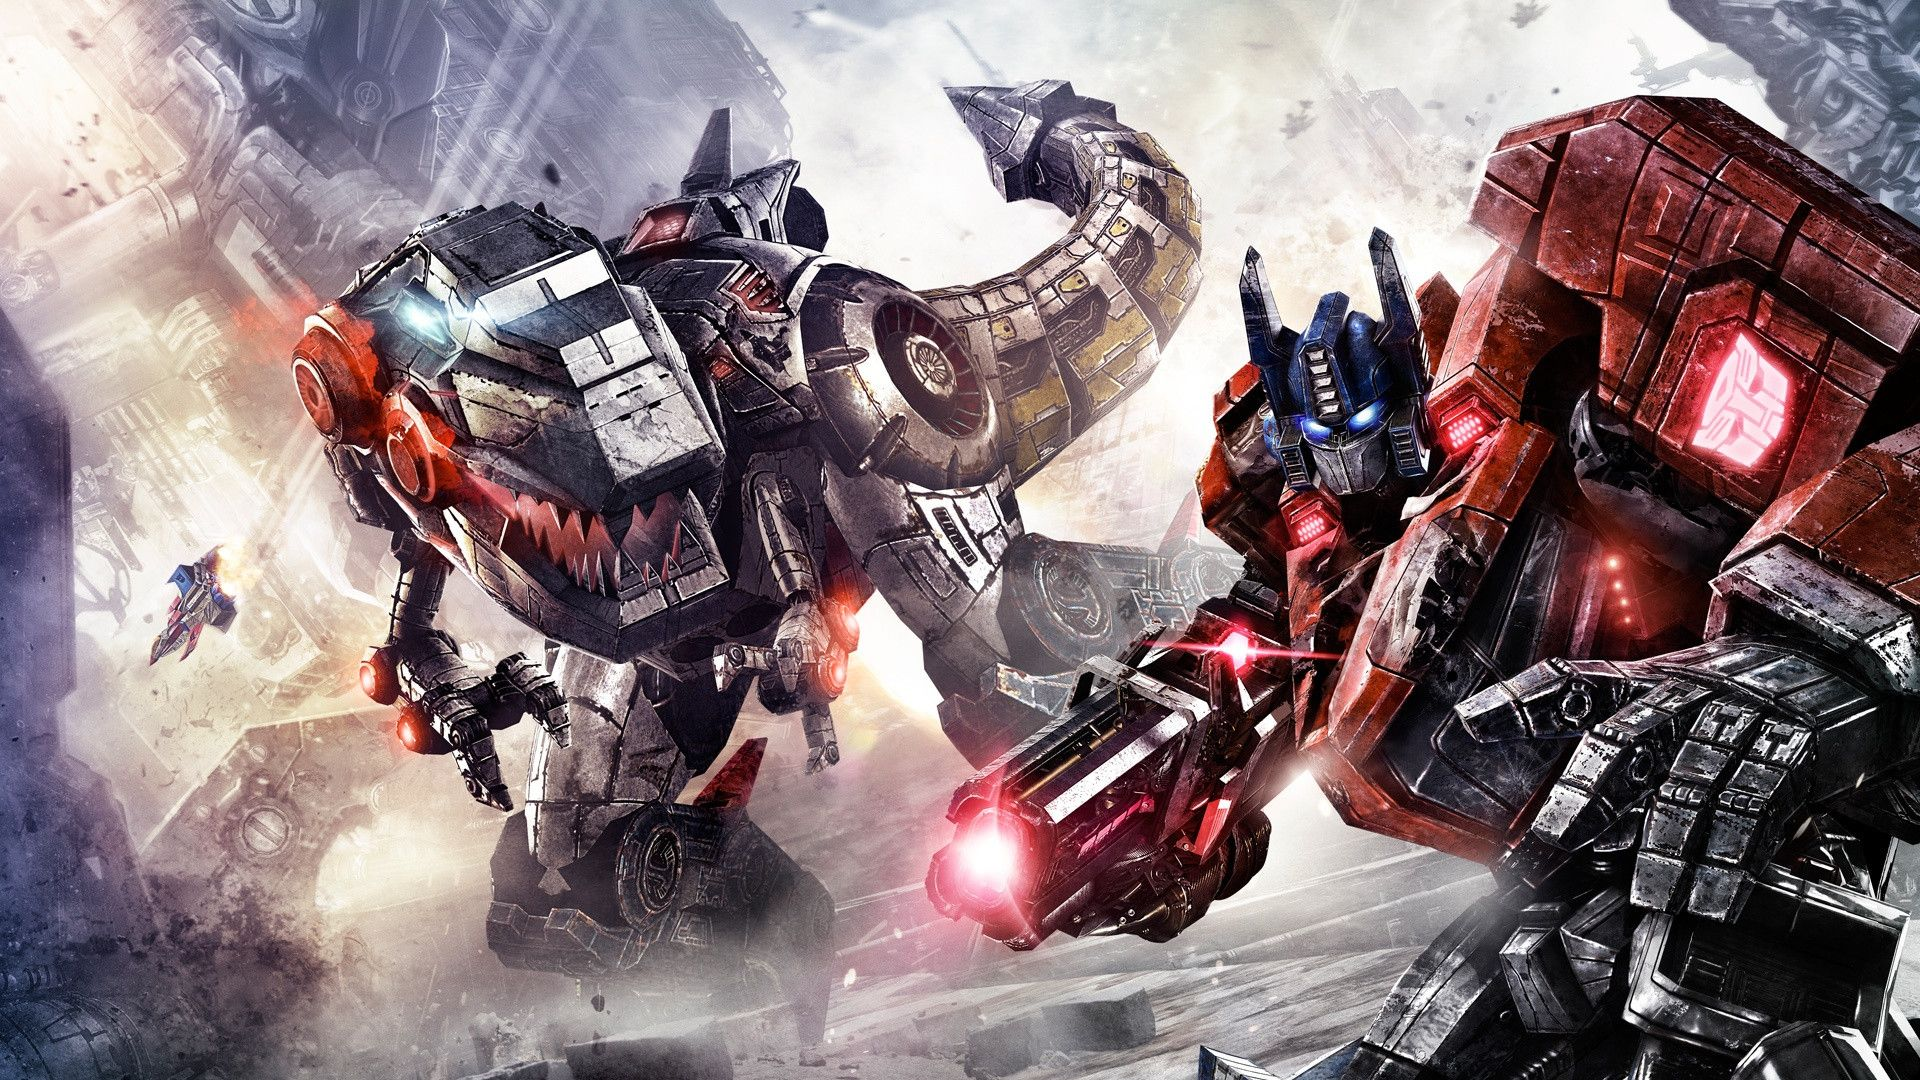 Autobot Optimus Prime Transformers HD Wallpaper Background 1920x1080